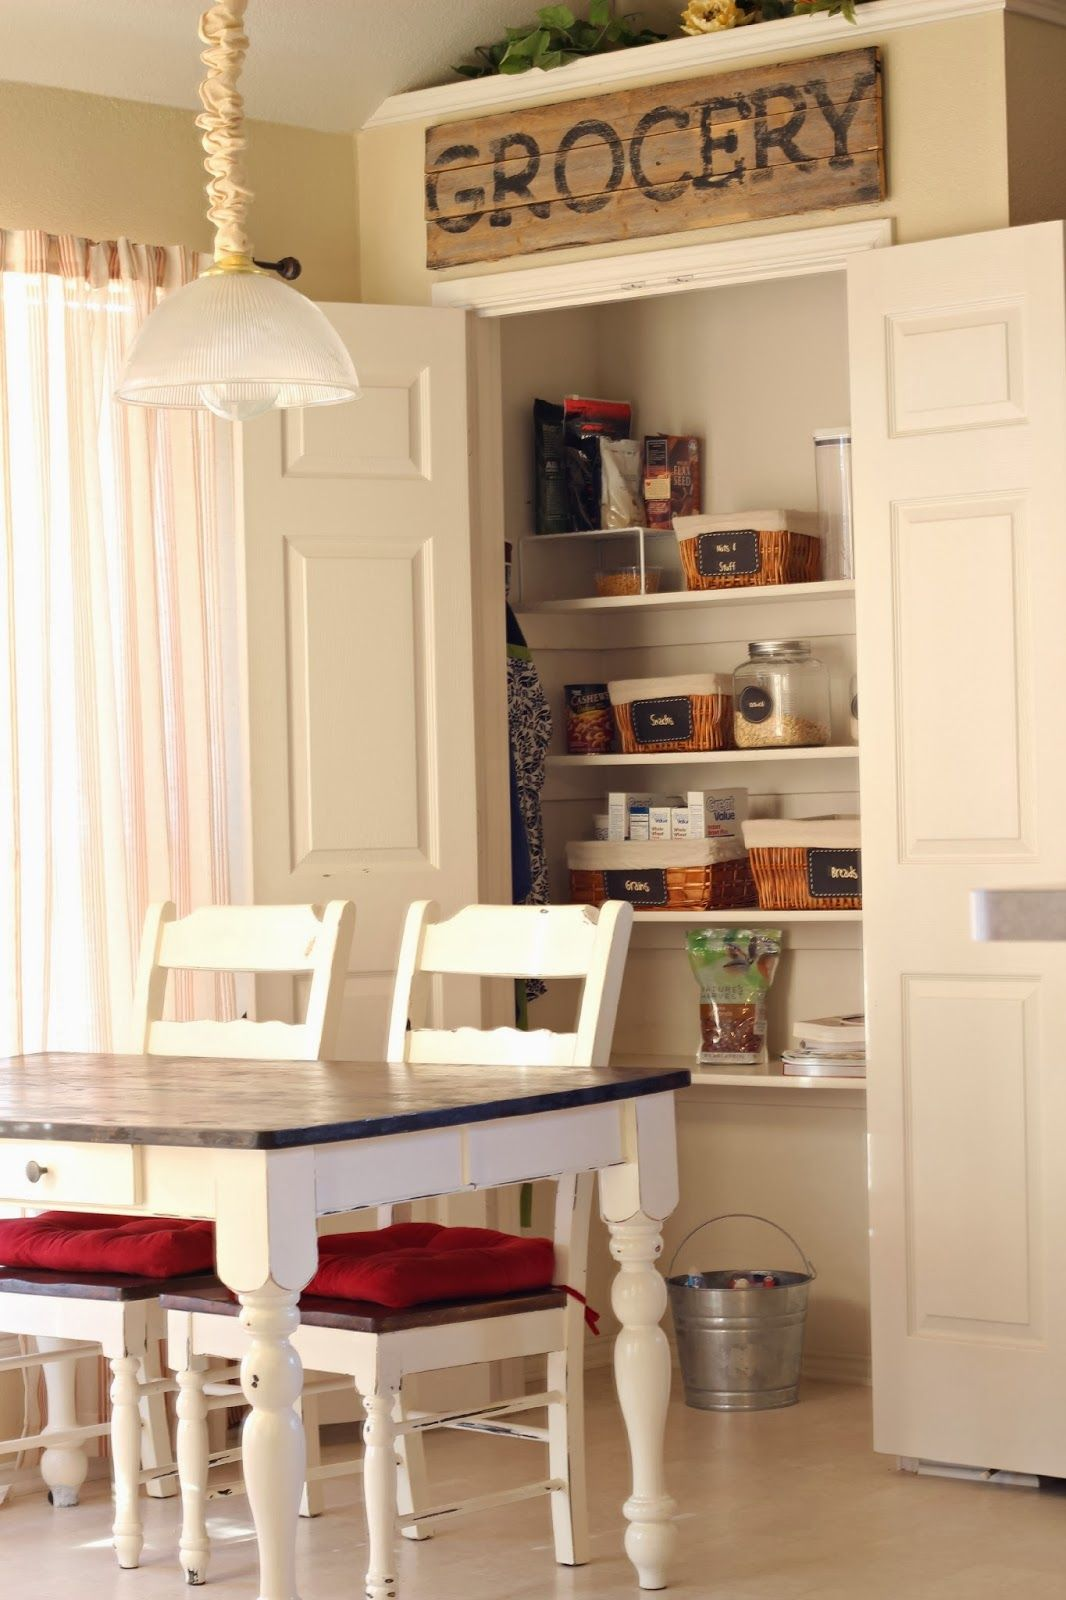 country farmhouse with awesome pantry organization diy kitchen ideas pantry kitchen pantry on kitchen organization diy id=20989